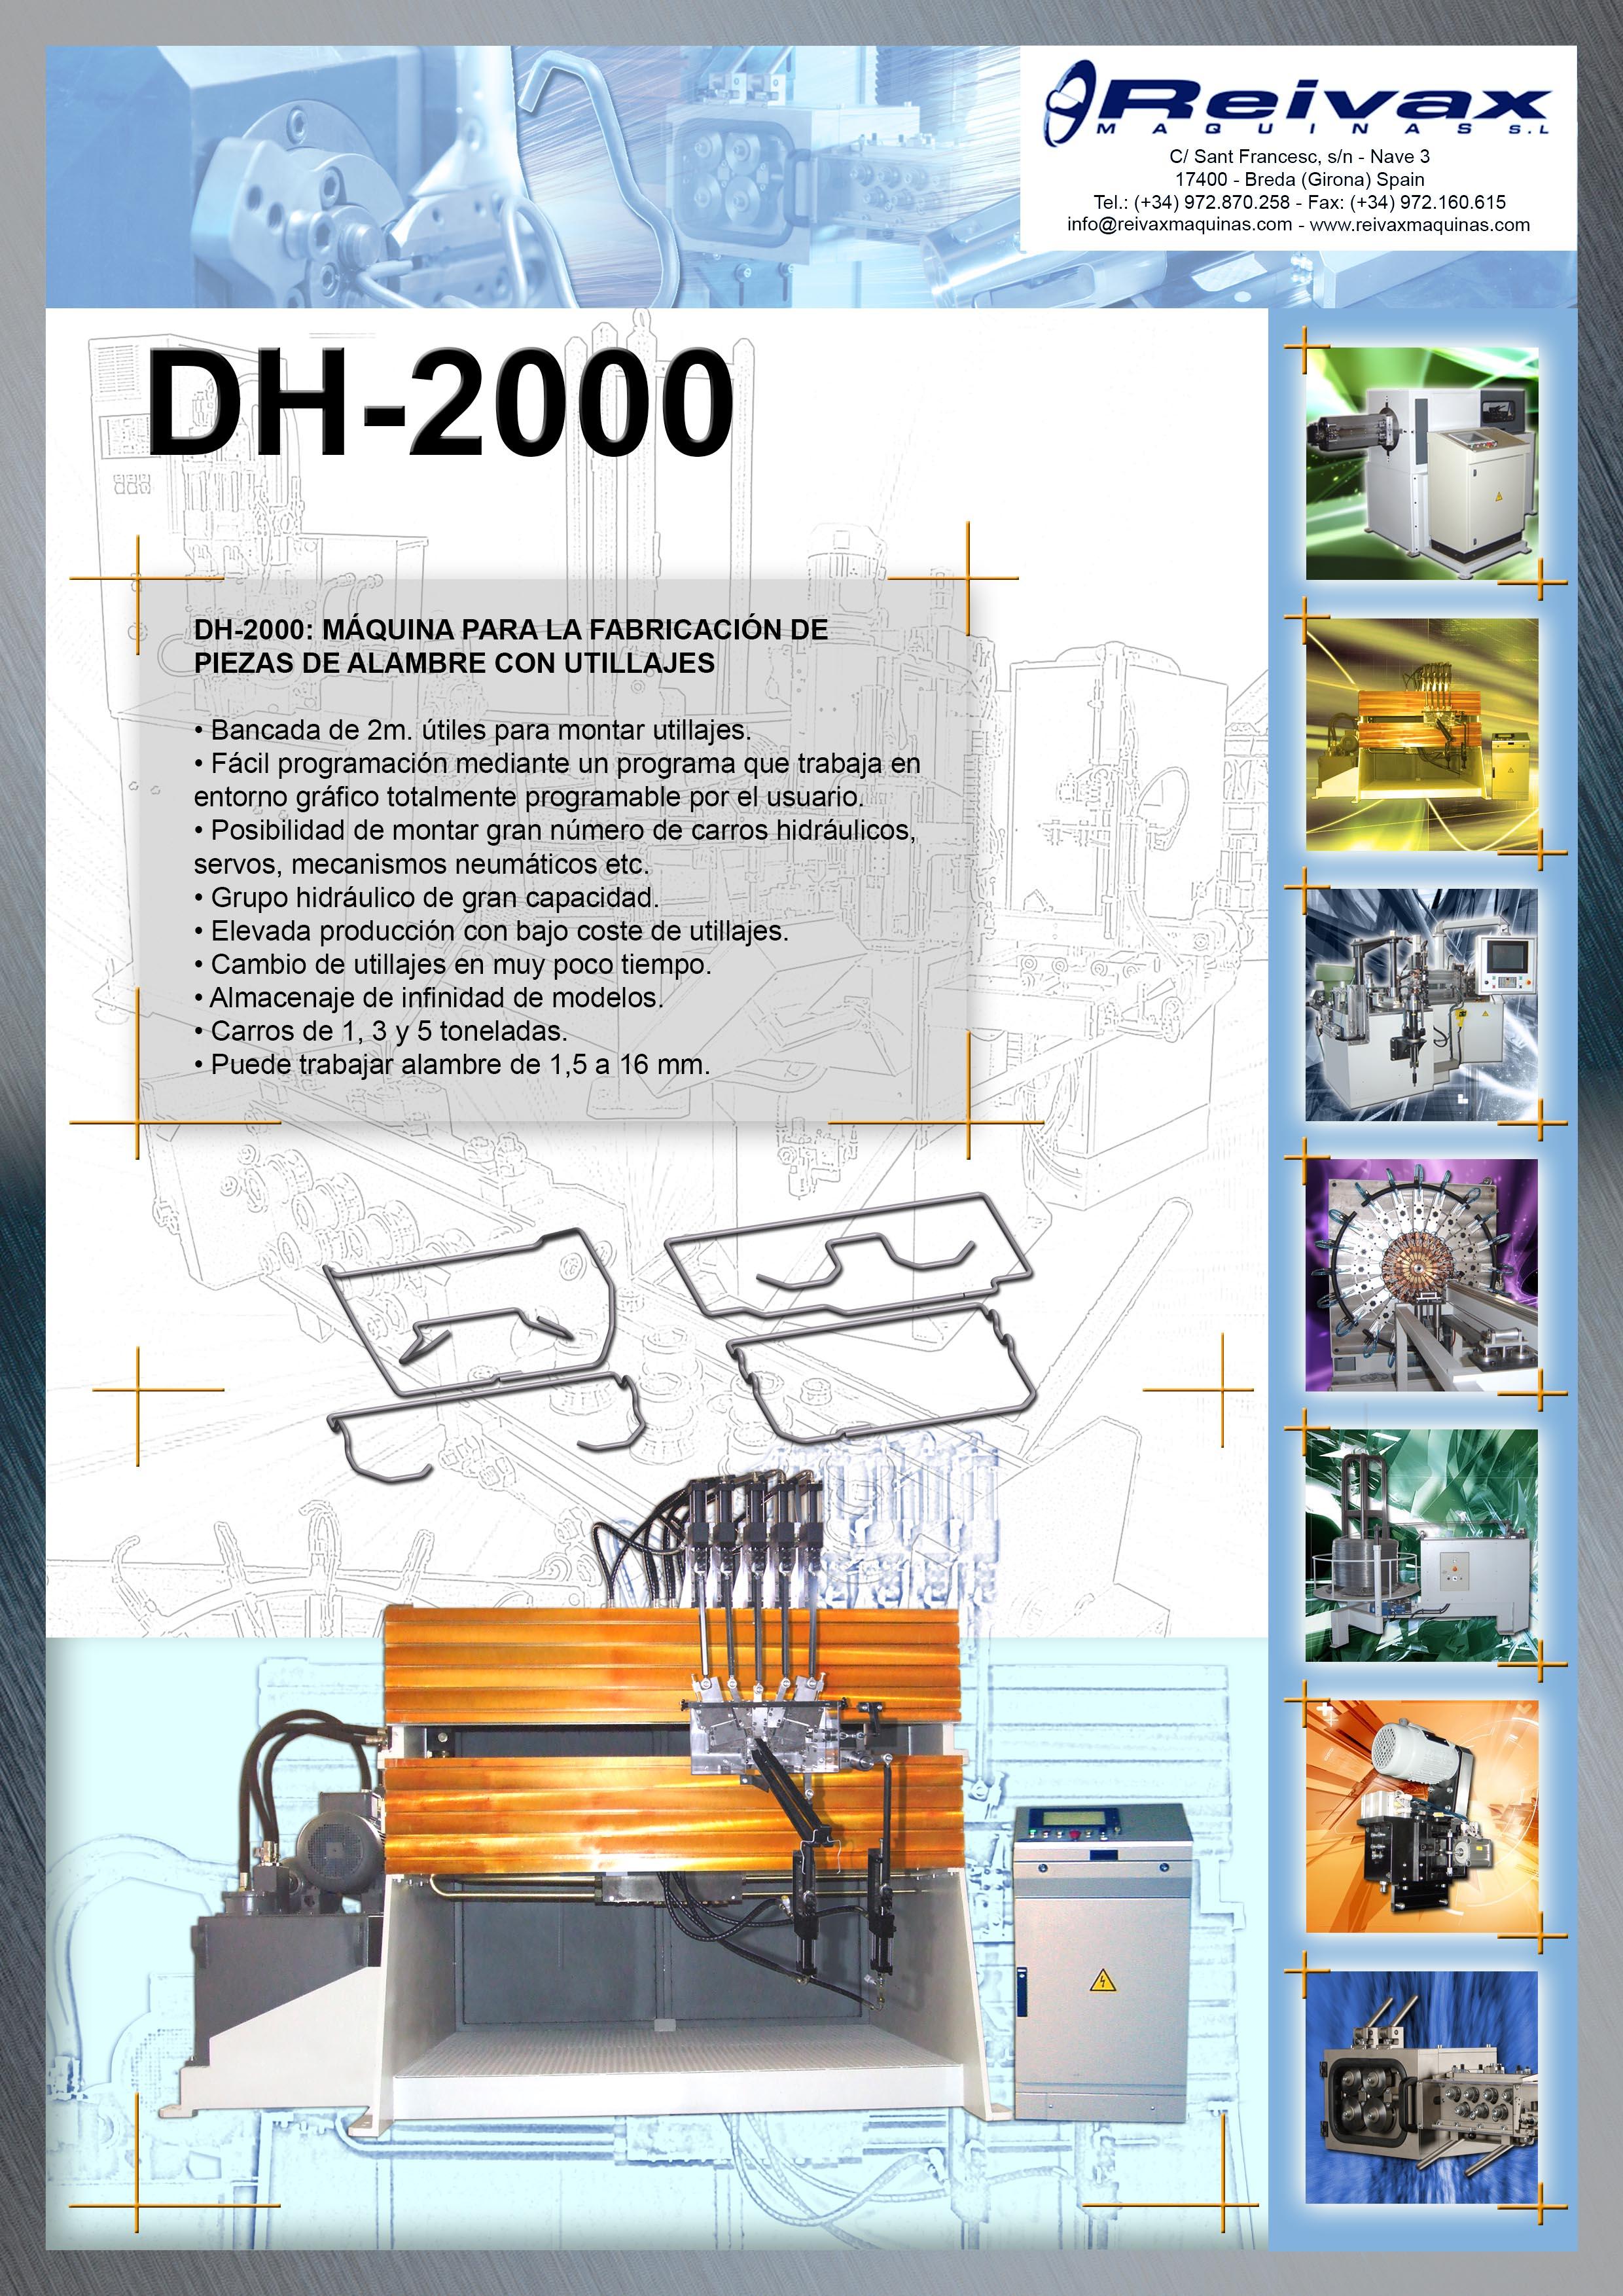 ReivaxMaquinas: Ficha Tecnica DH-2000